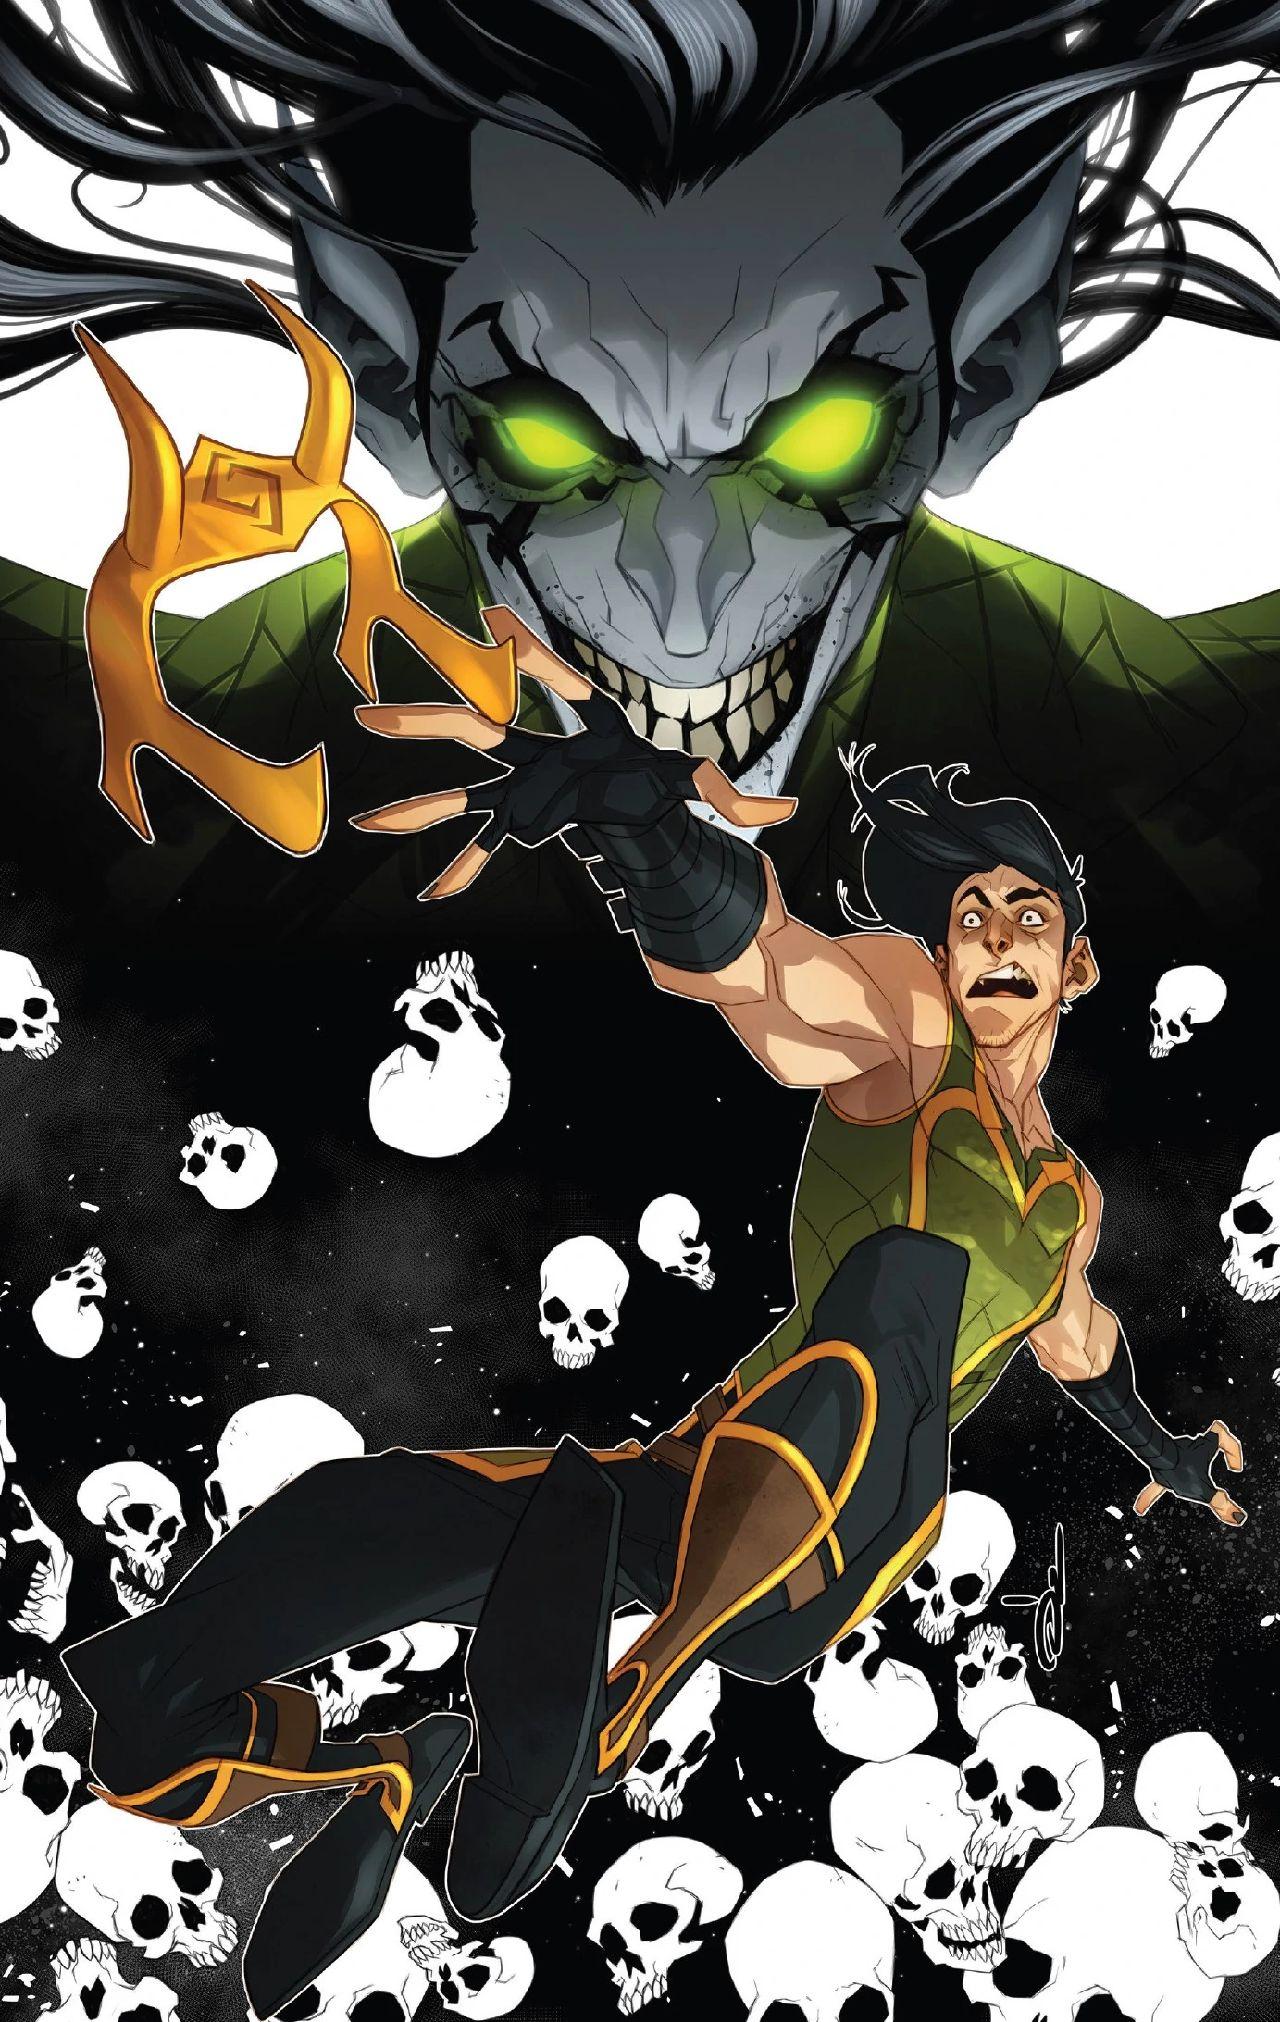 loki serie marvel comic nightmare enemigo antagonista